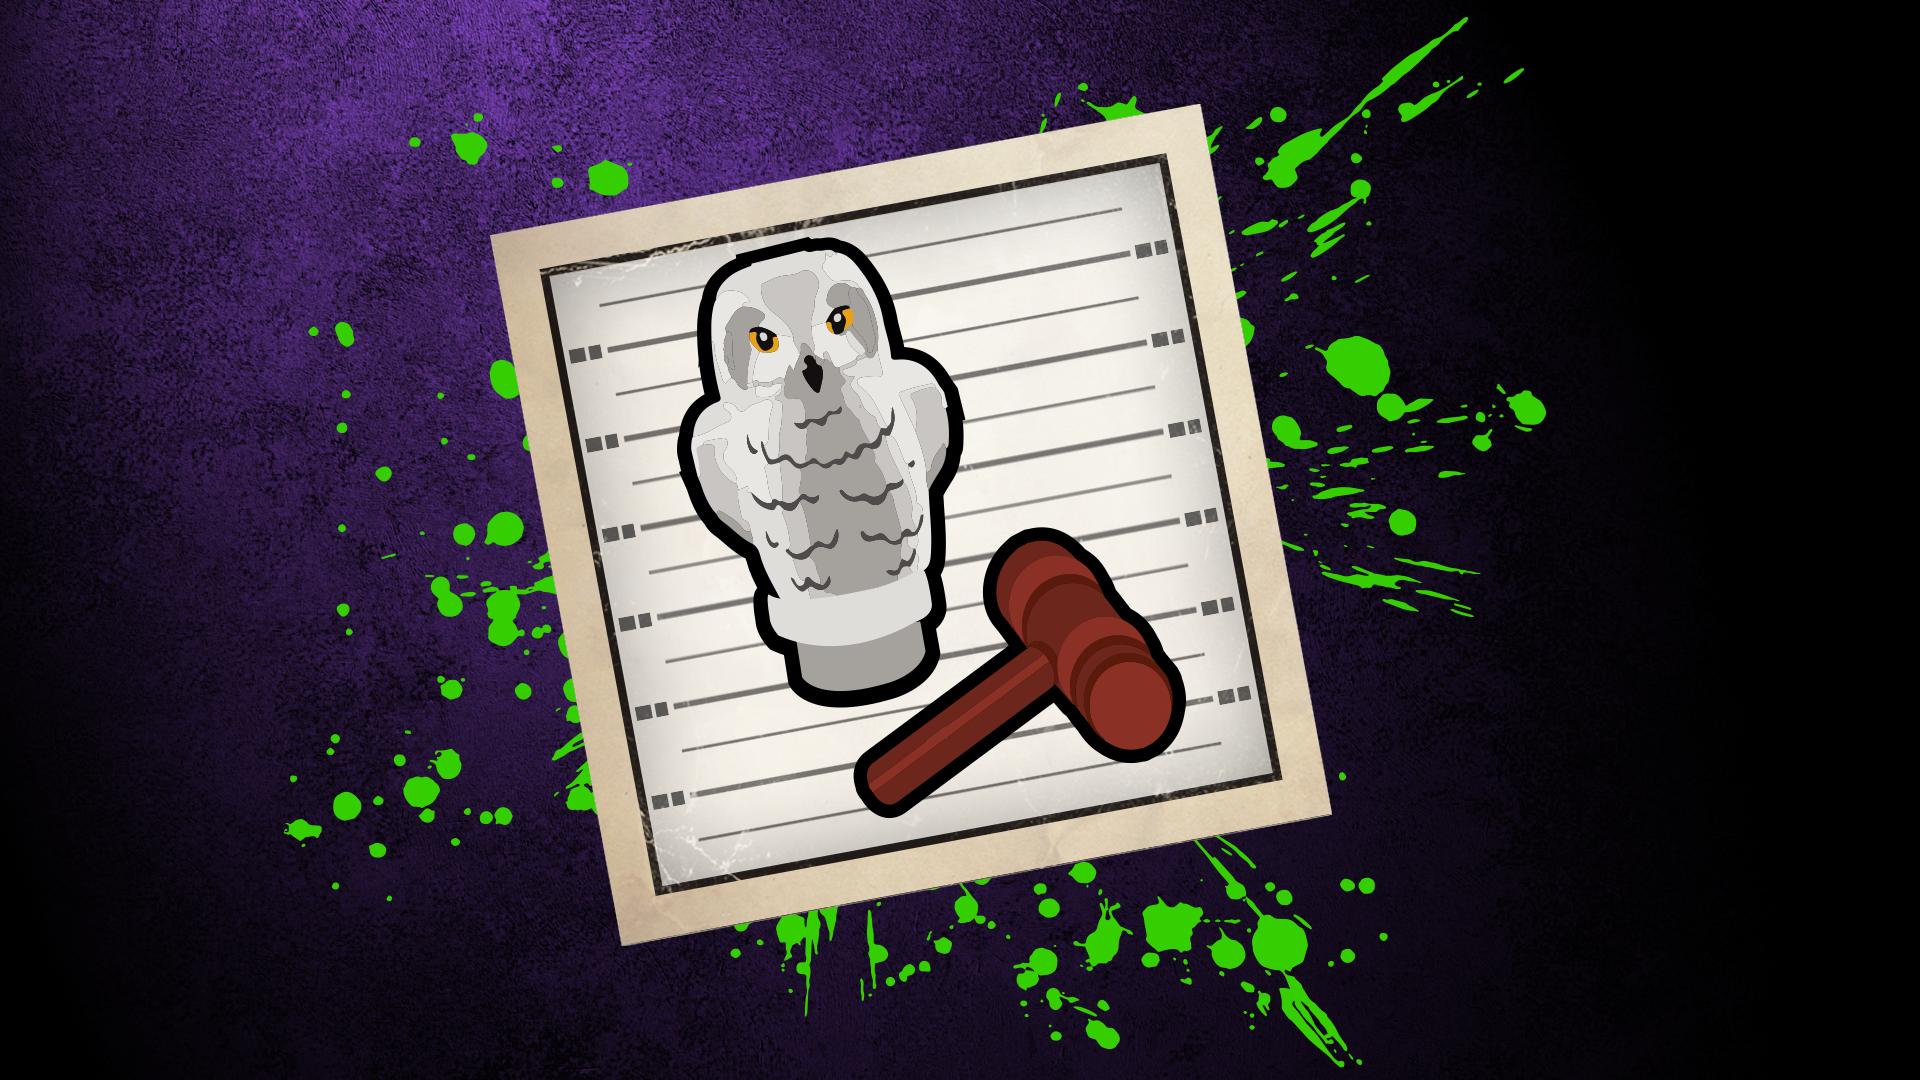 A Court of Owls